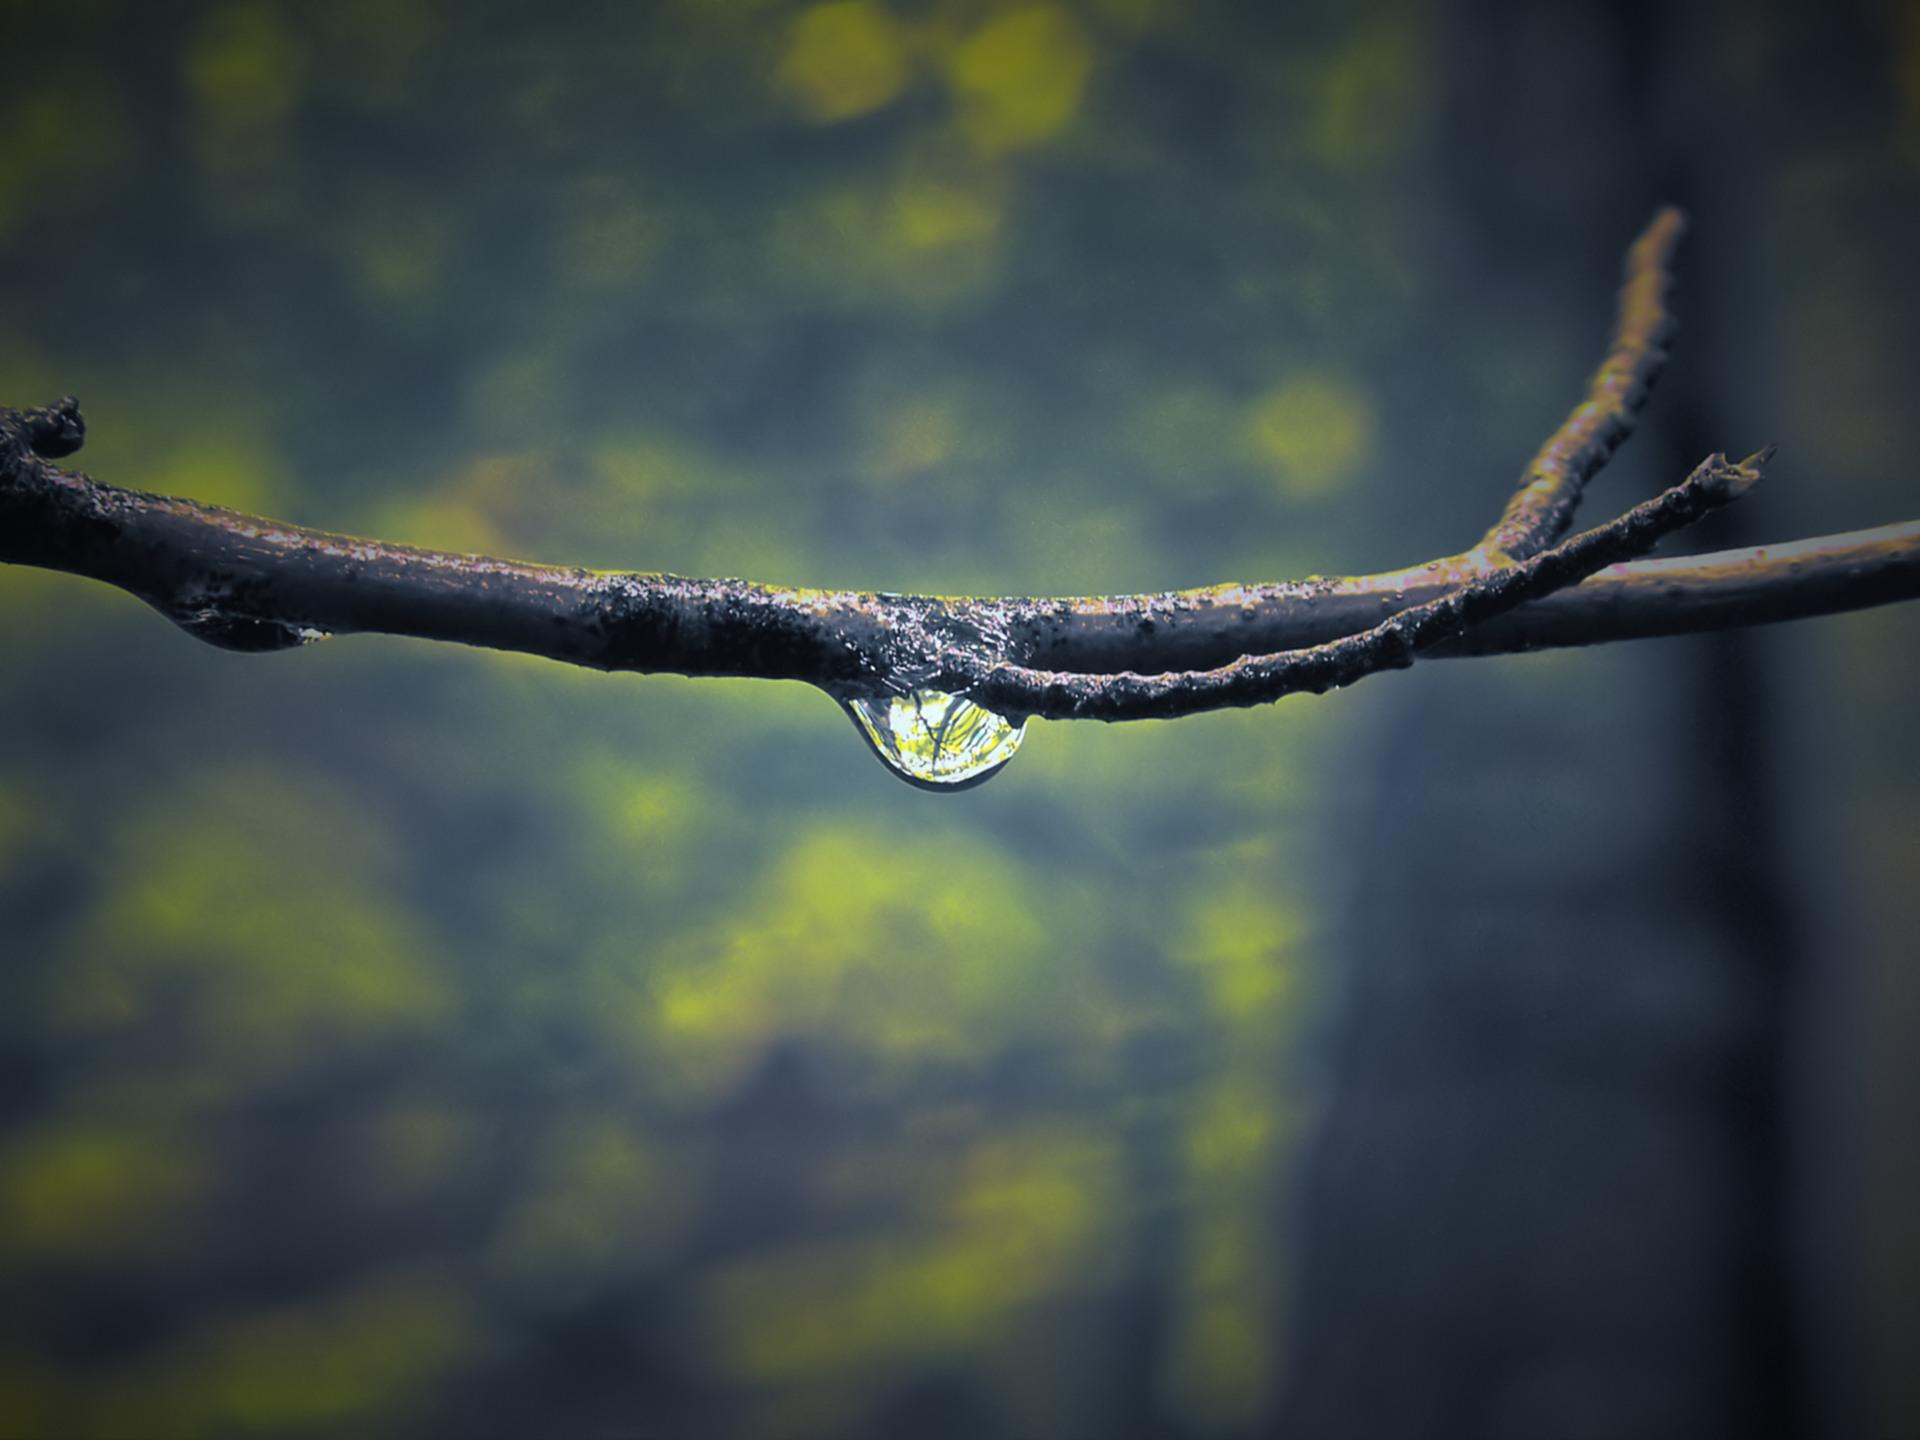 water drop on twig